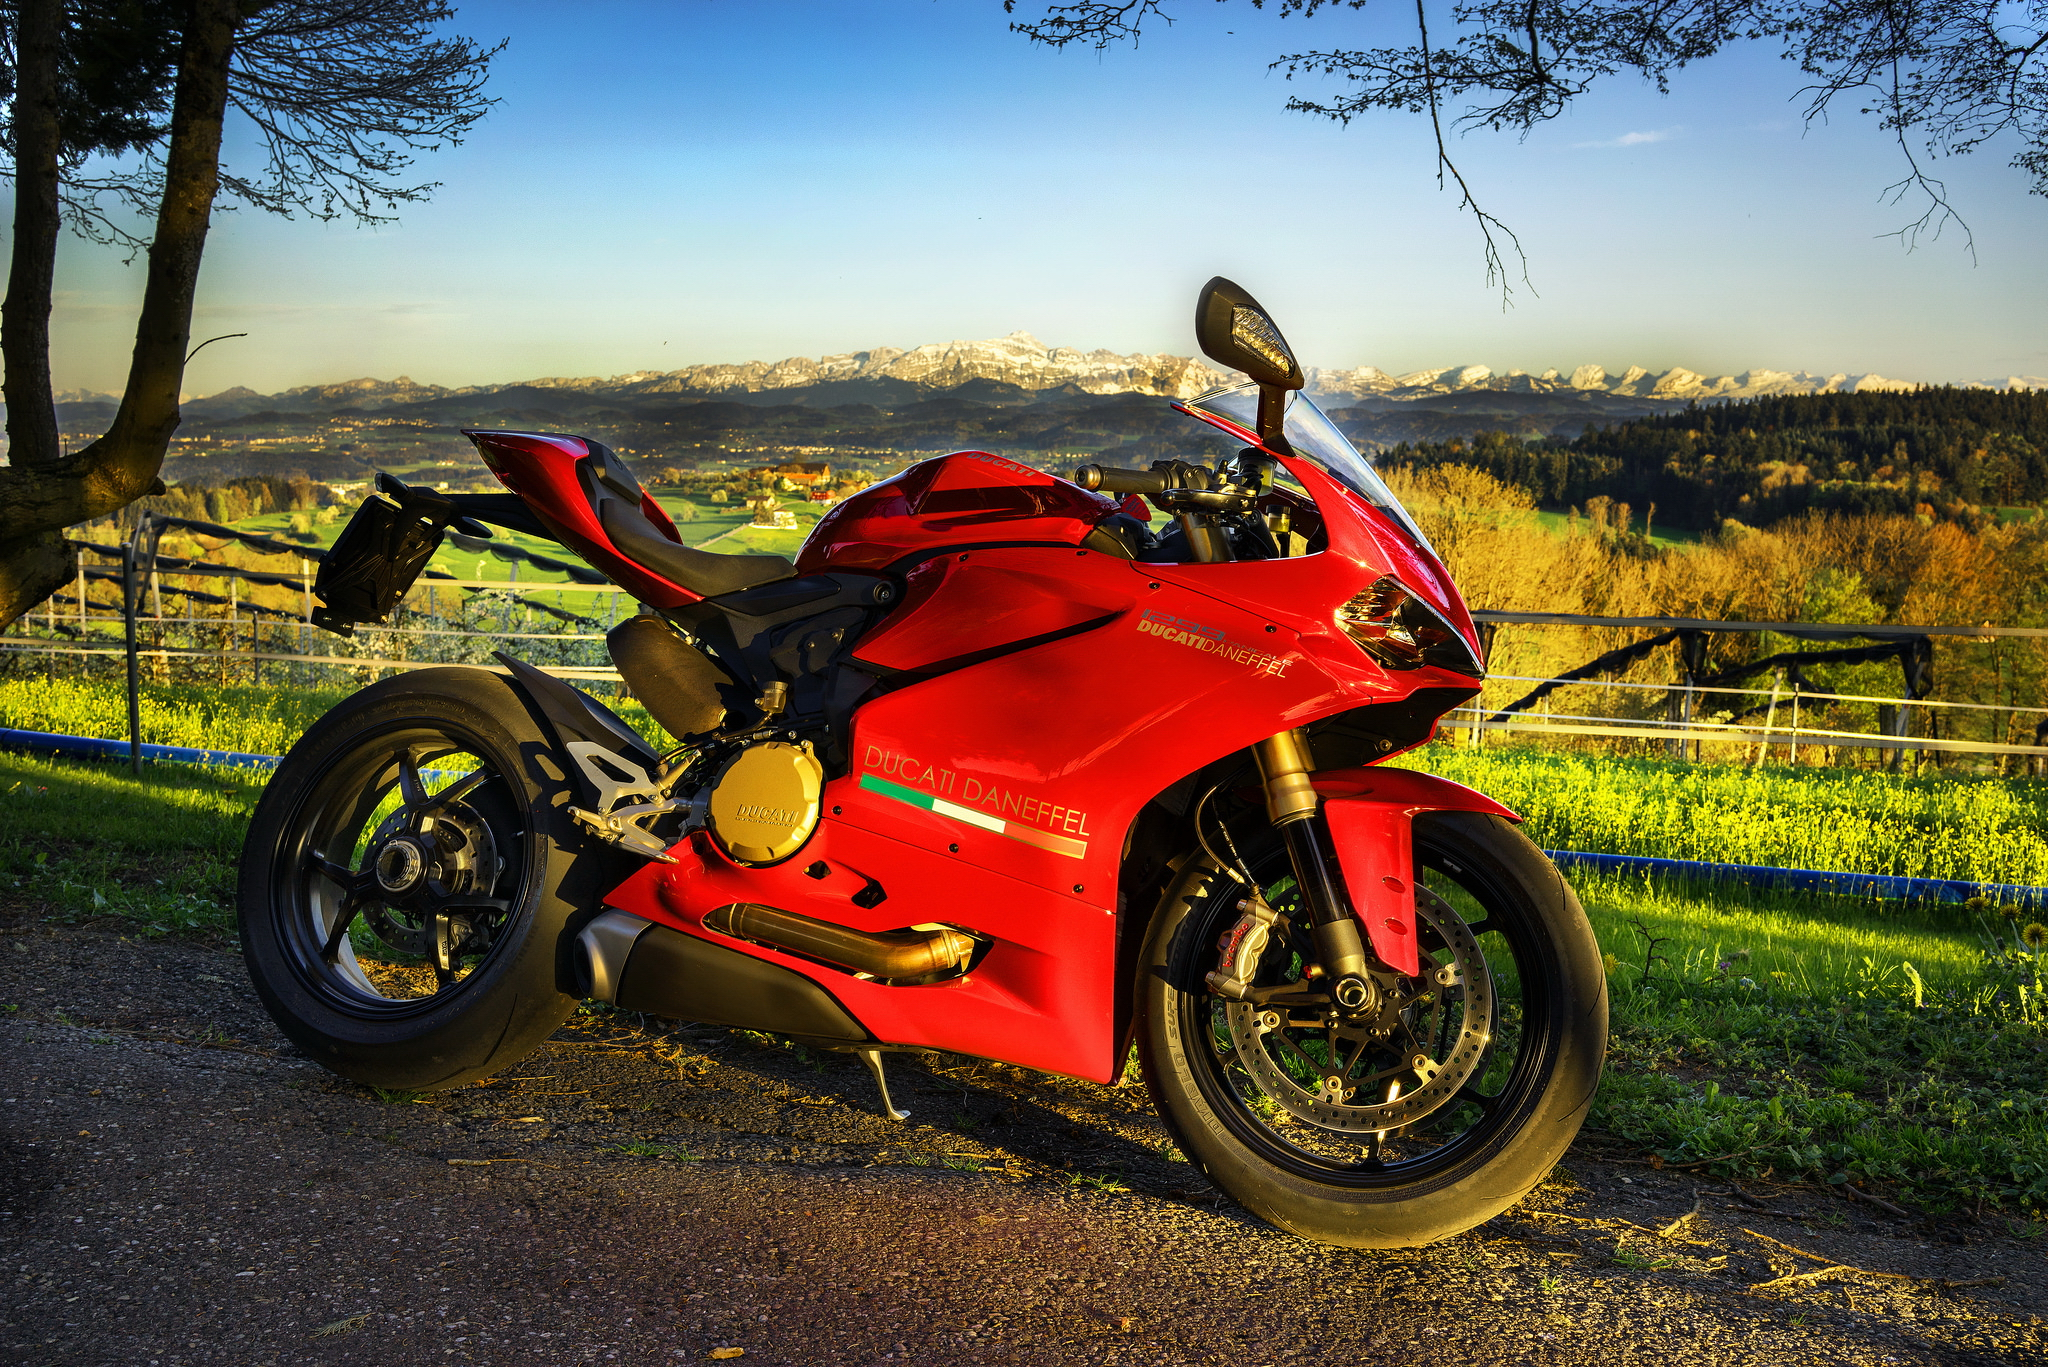 же, картинки байки мотоциклы фото своей экологичности